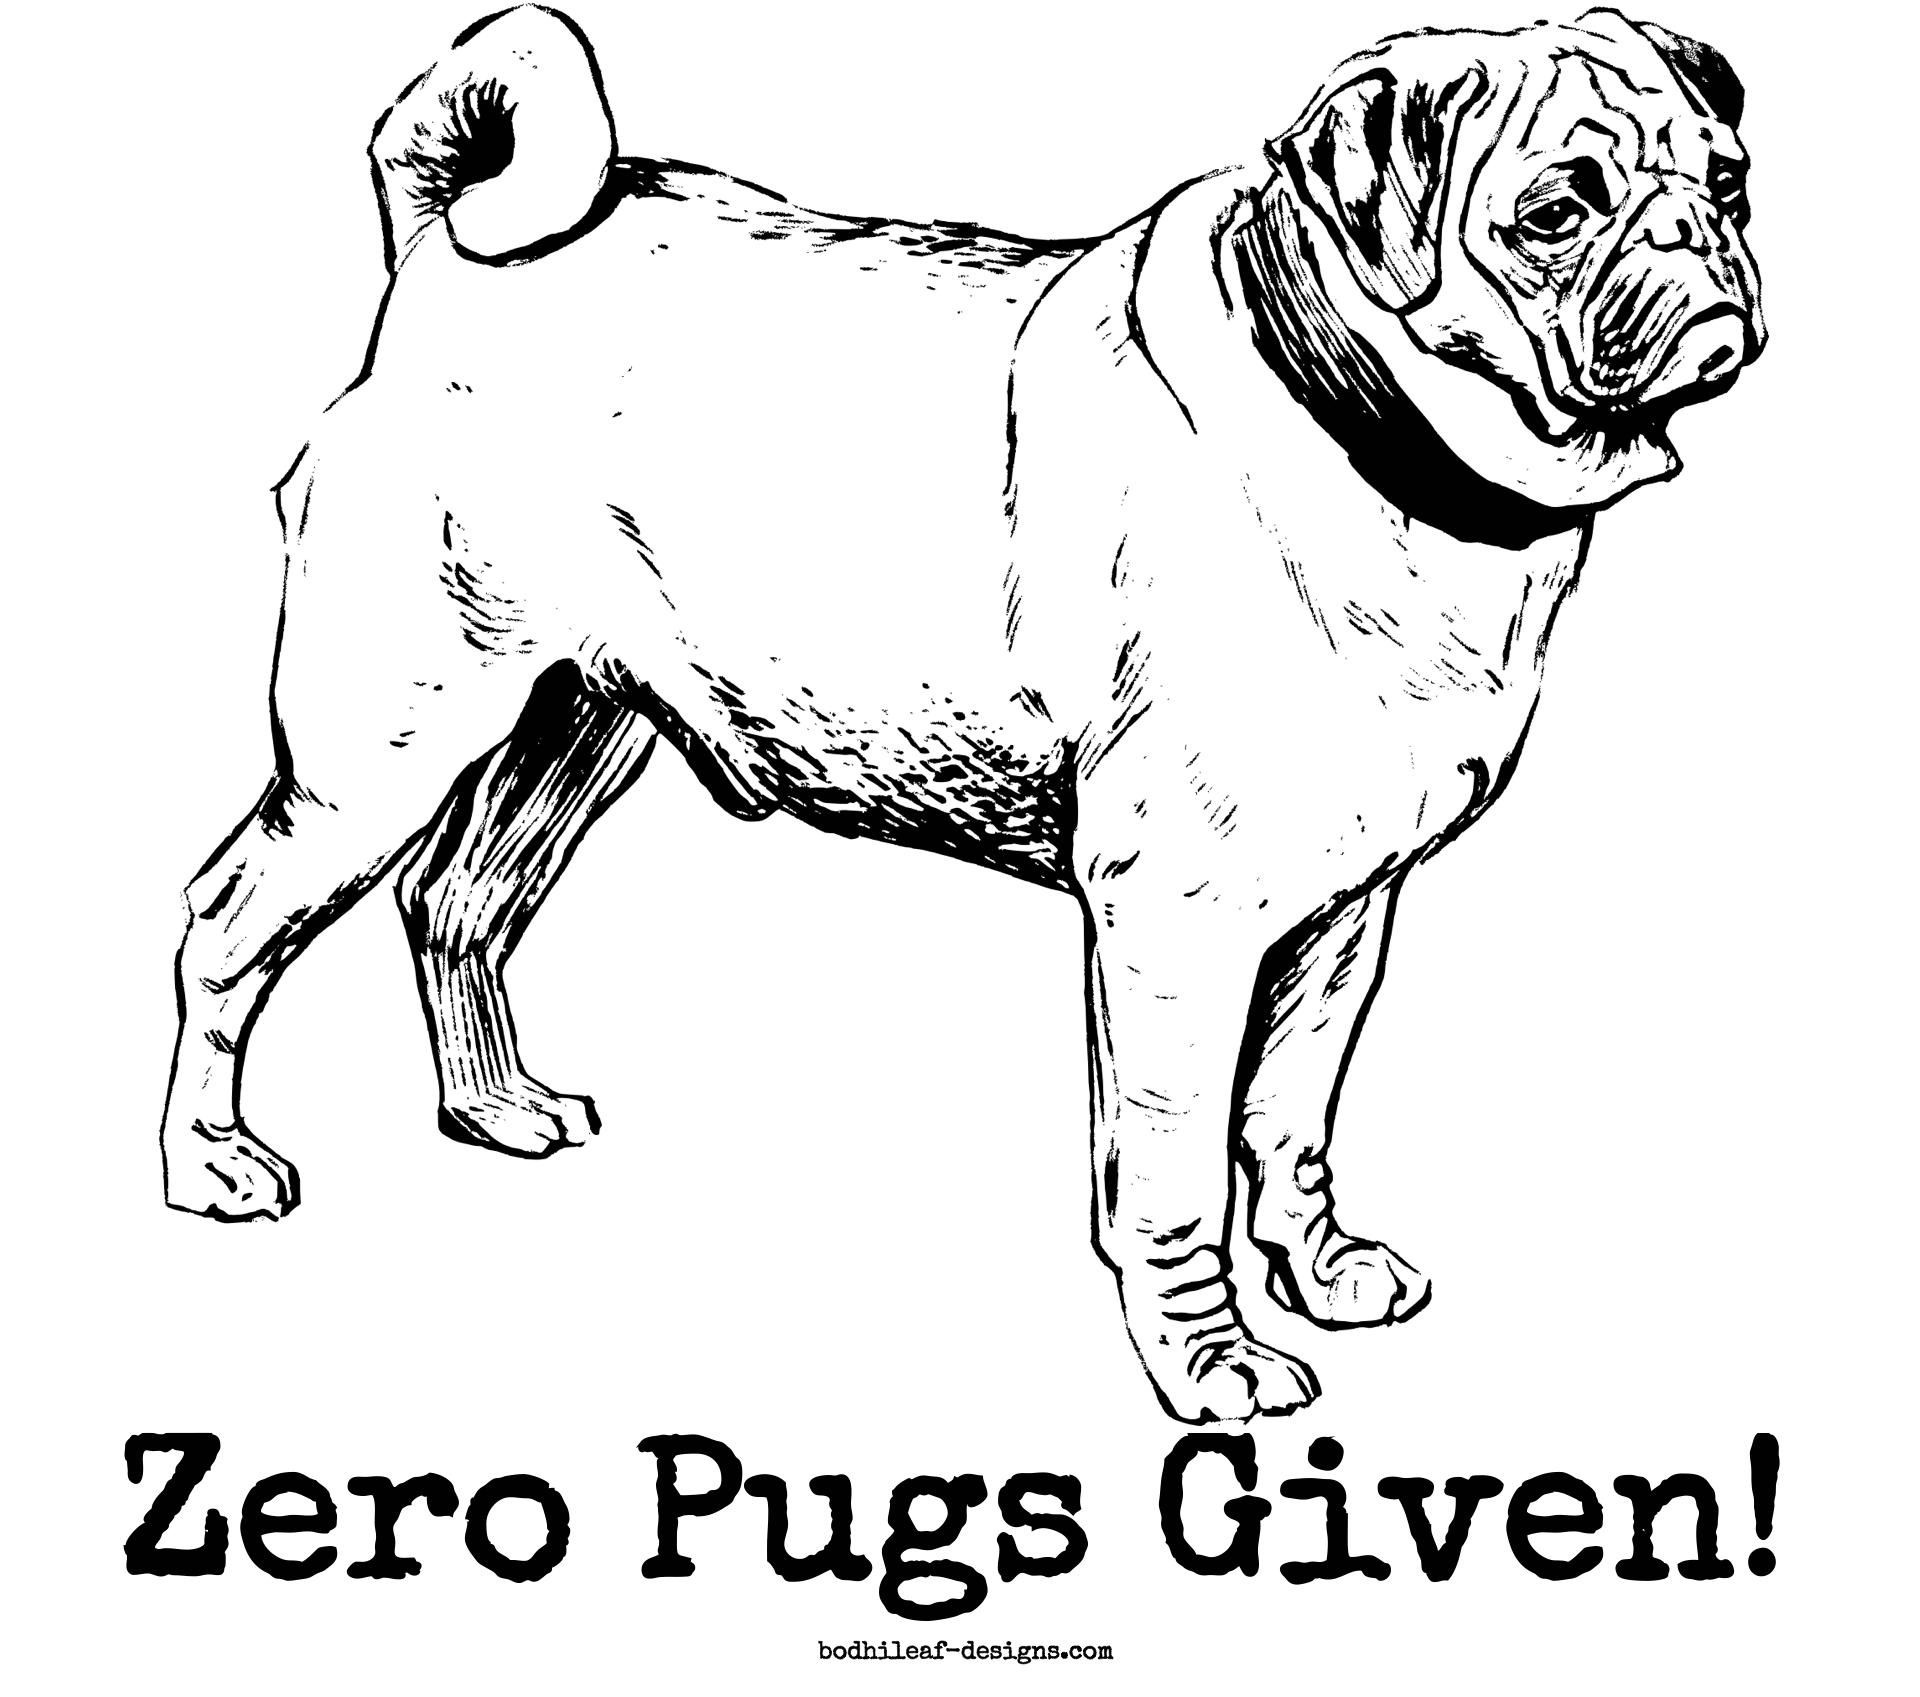 Zero_Pucks_Given_white.png